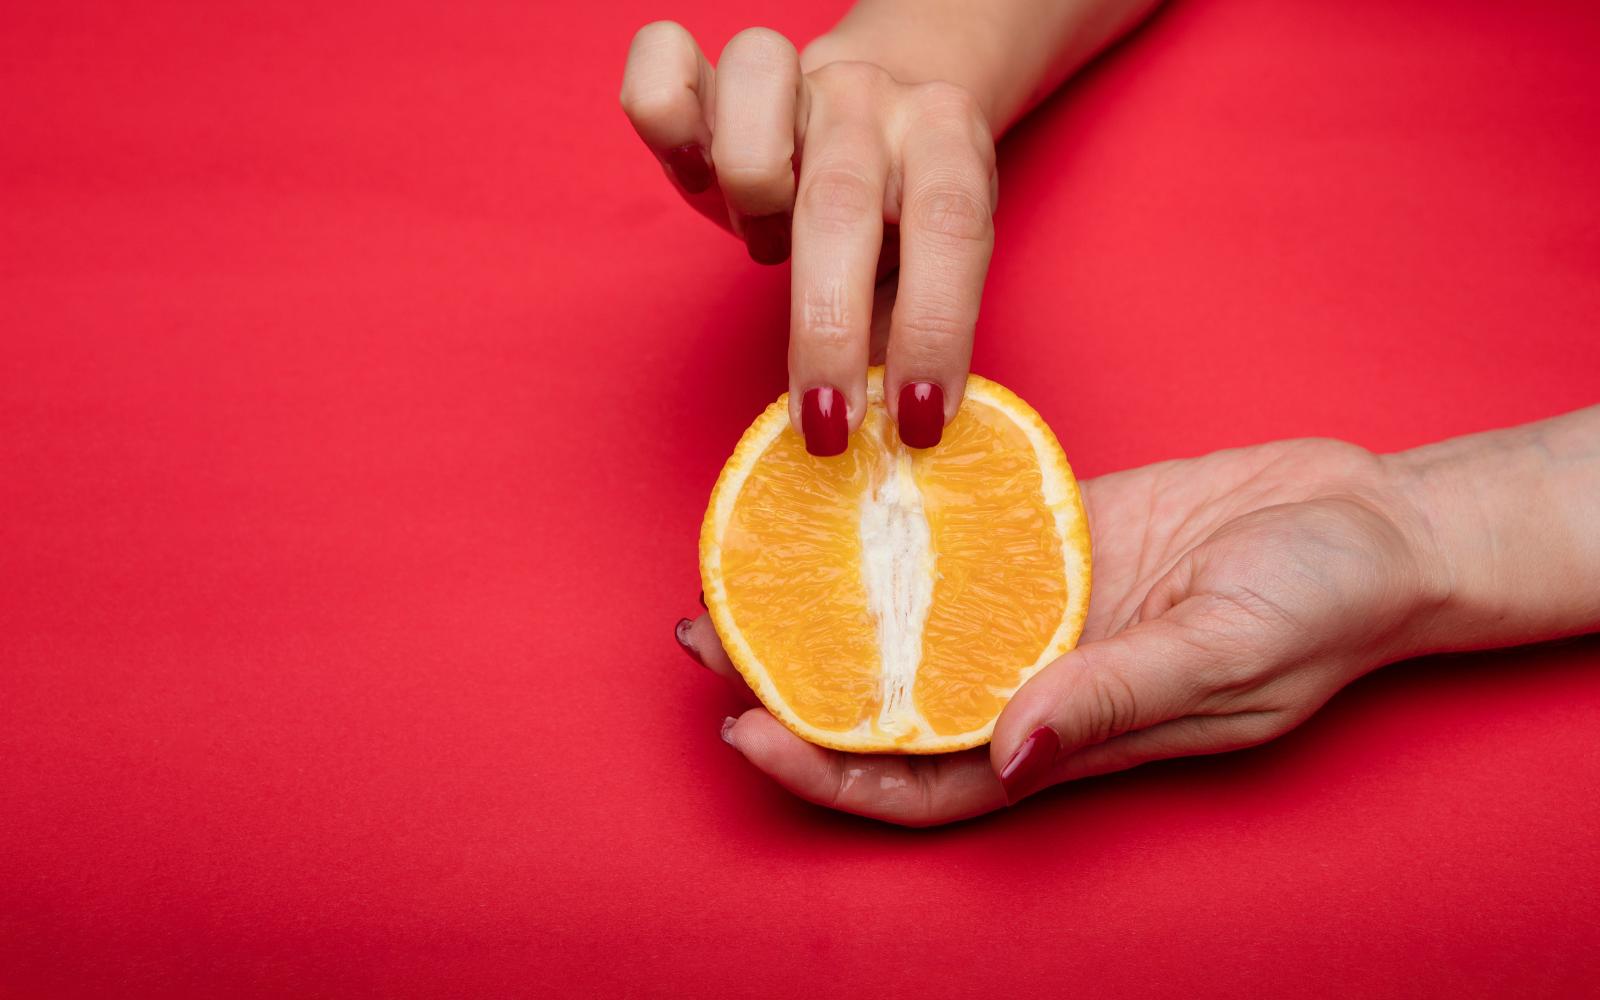 Clitoris Stimulators for Women Orgasm